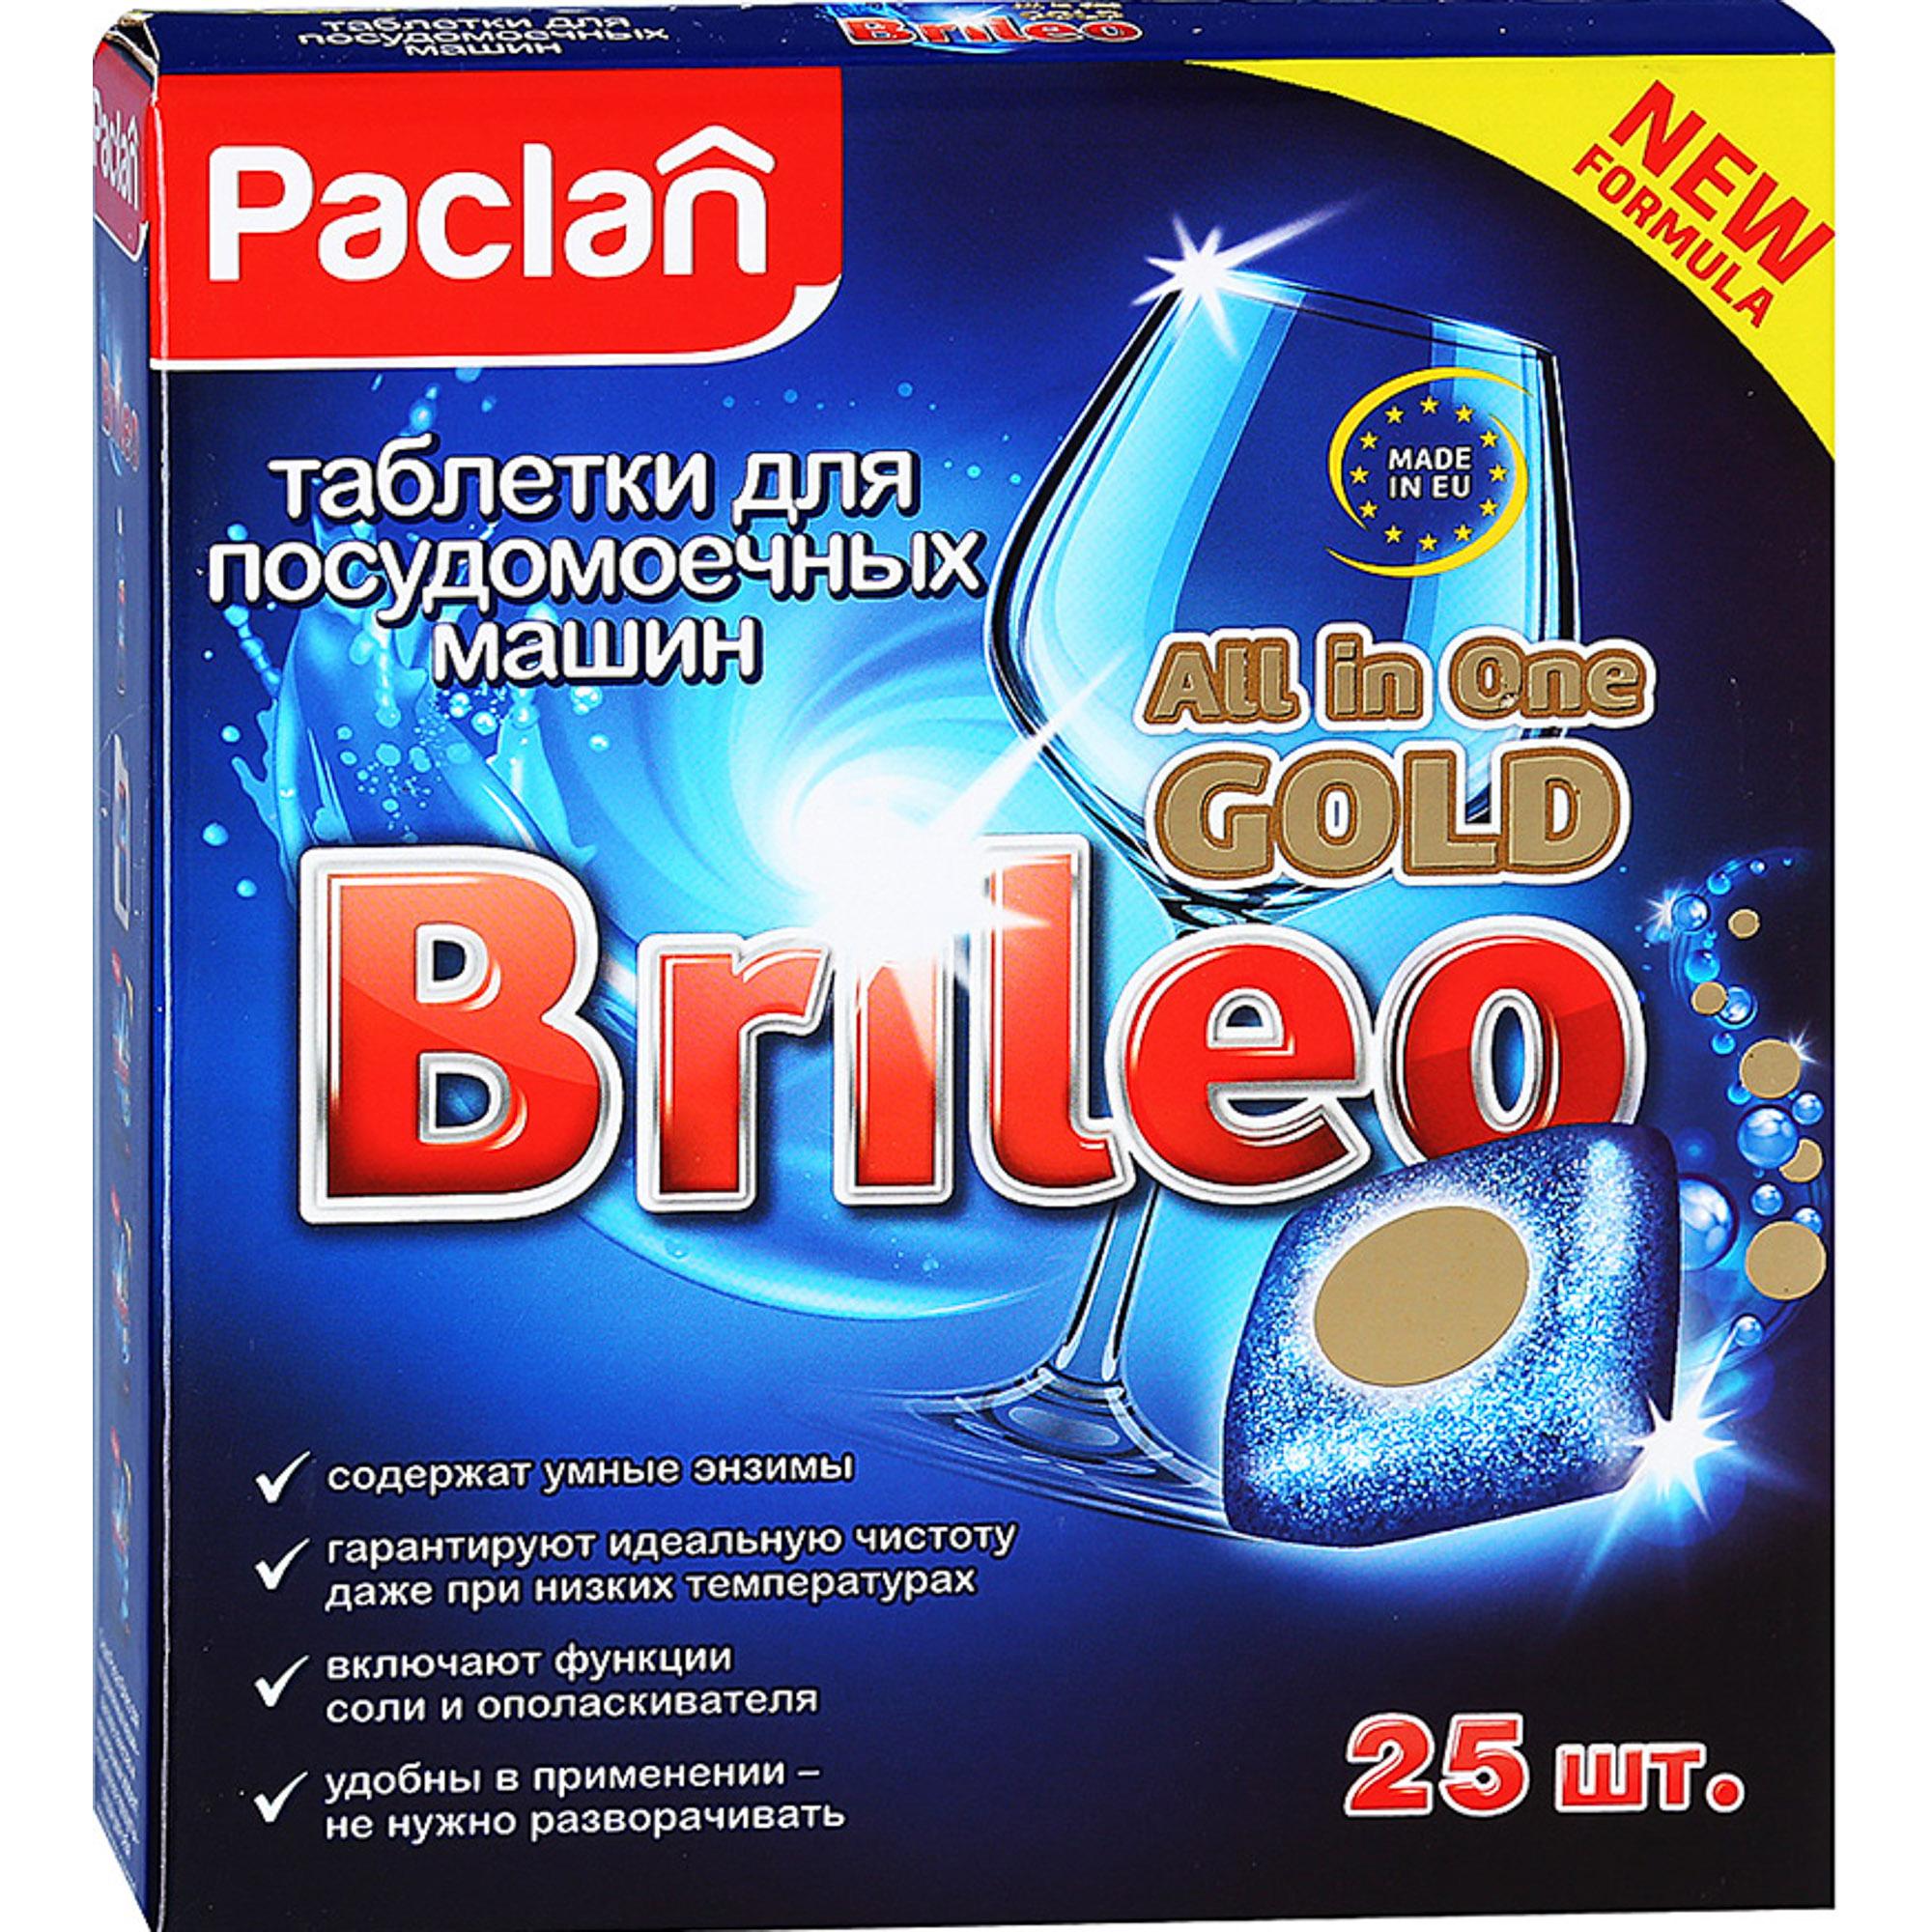 Таблетки для посудомоечных машин Paclan Brileo All in one Gold 25 шт.